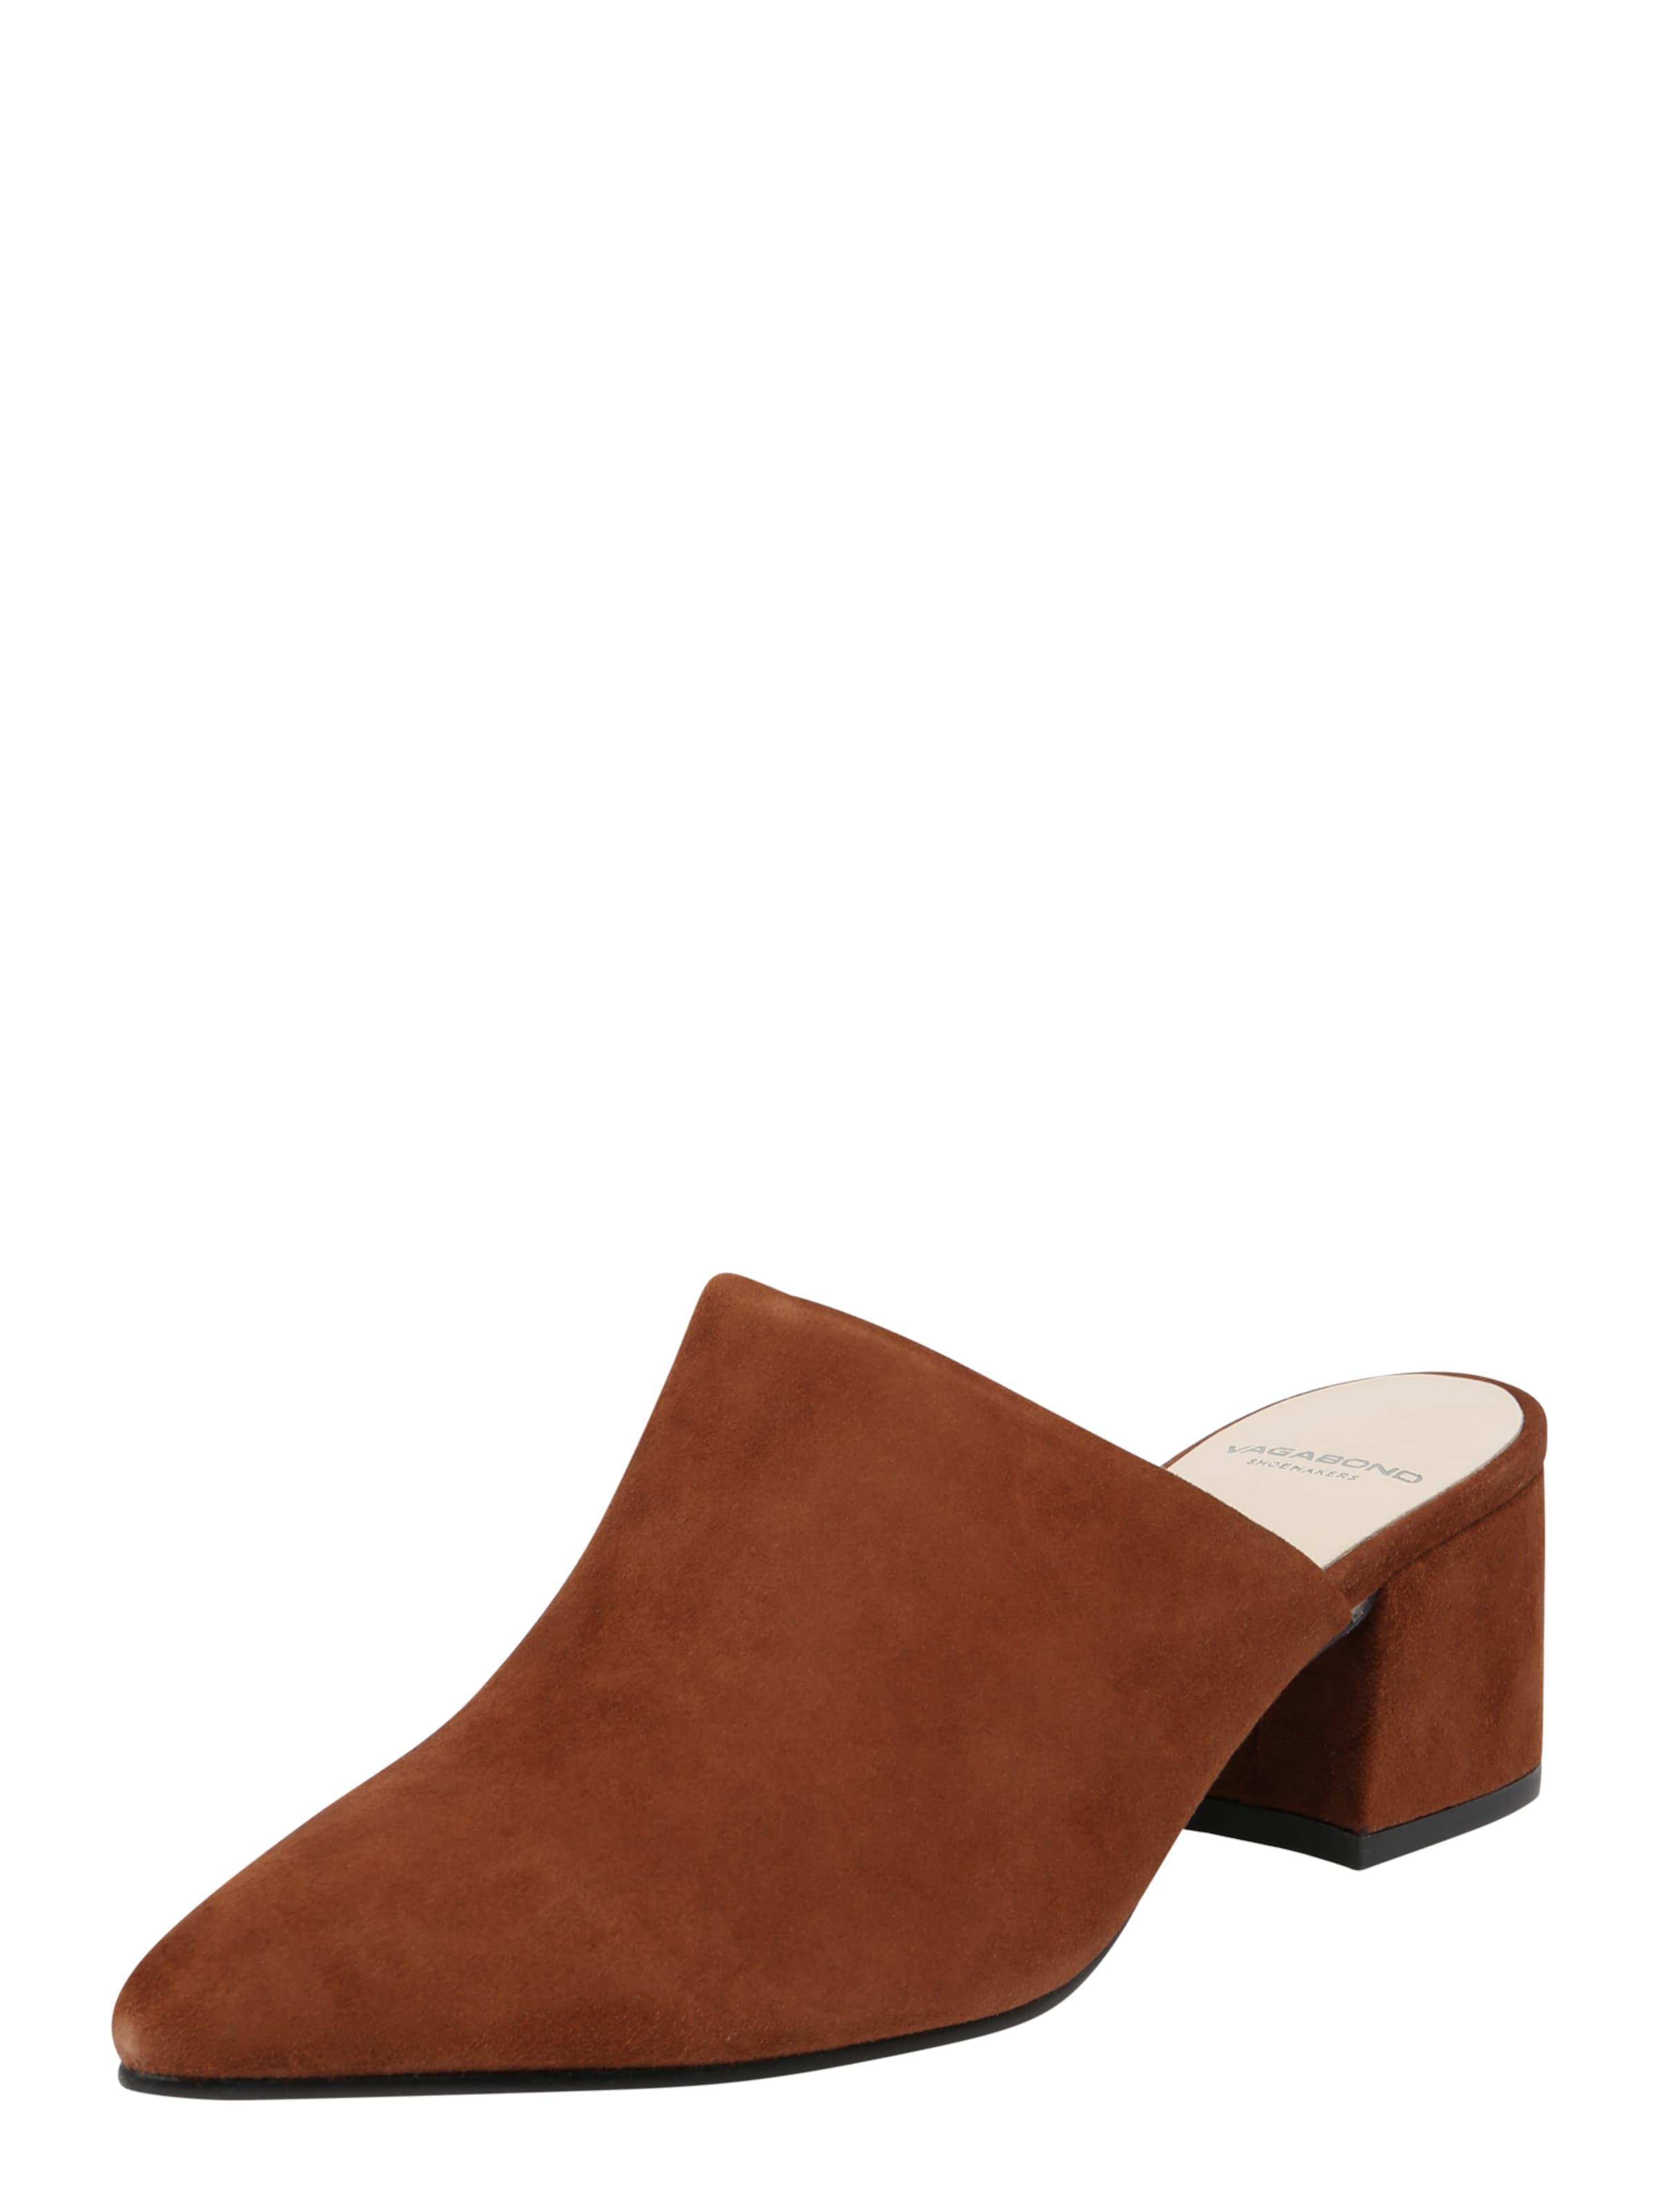 In Pantolette Rostbraun Shoemakers Vagabond 'mya' fyb7gIY6v